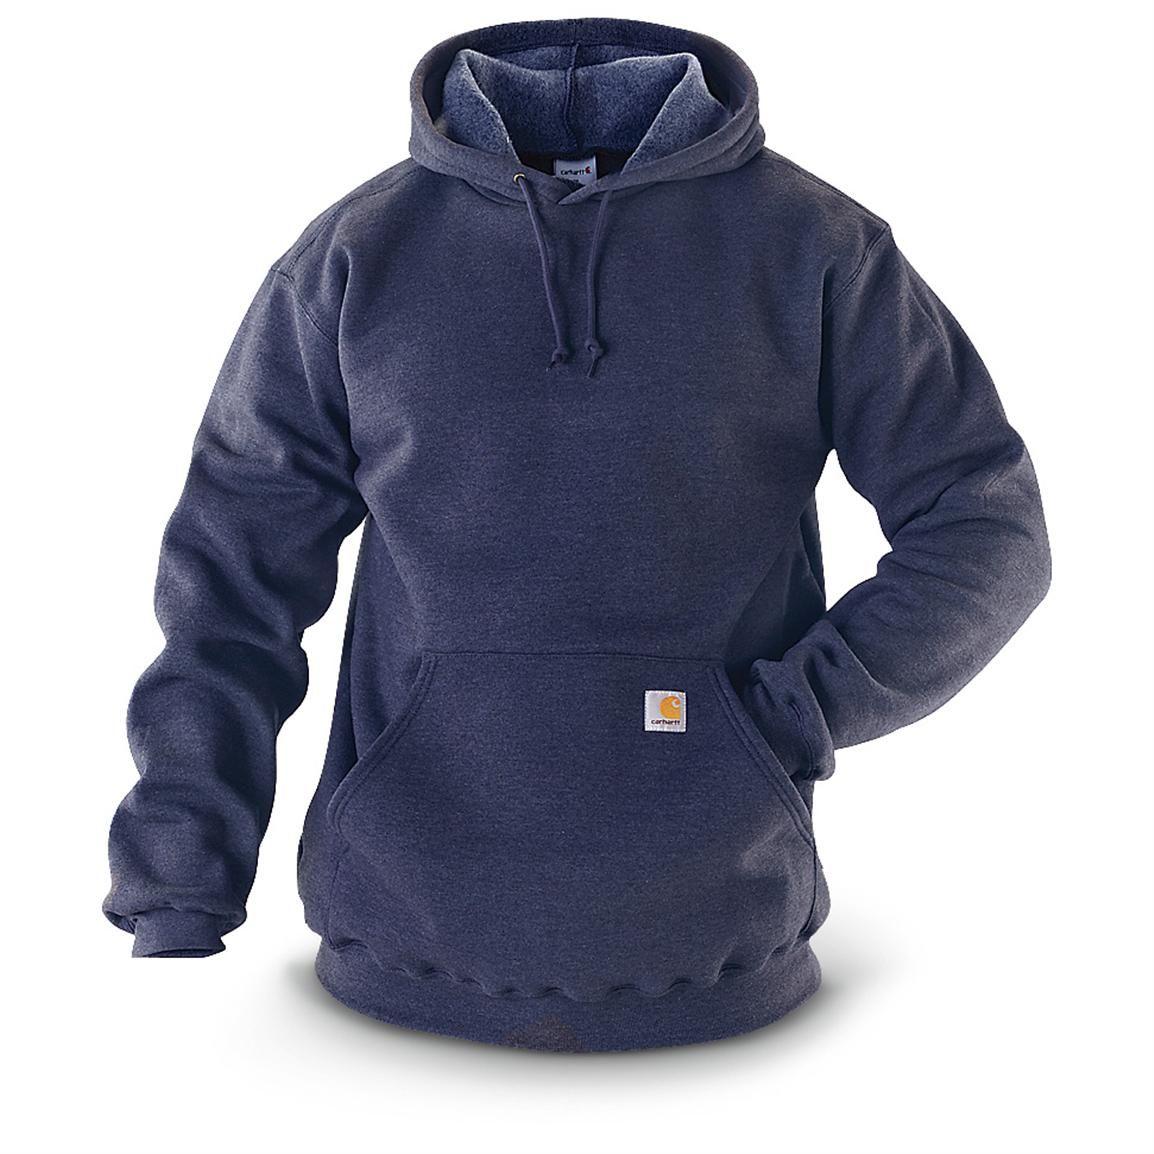 Carhartt Men S Midweight Hooded Pullover Sweatshirt Navy Carhartt Jacket Mens Fashion Rugged Sweatshirts [ 1154 x 1154 Pixel ]